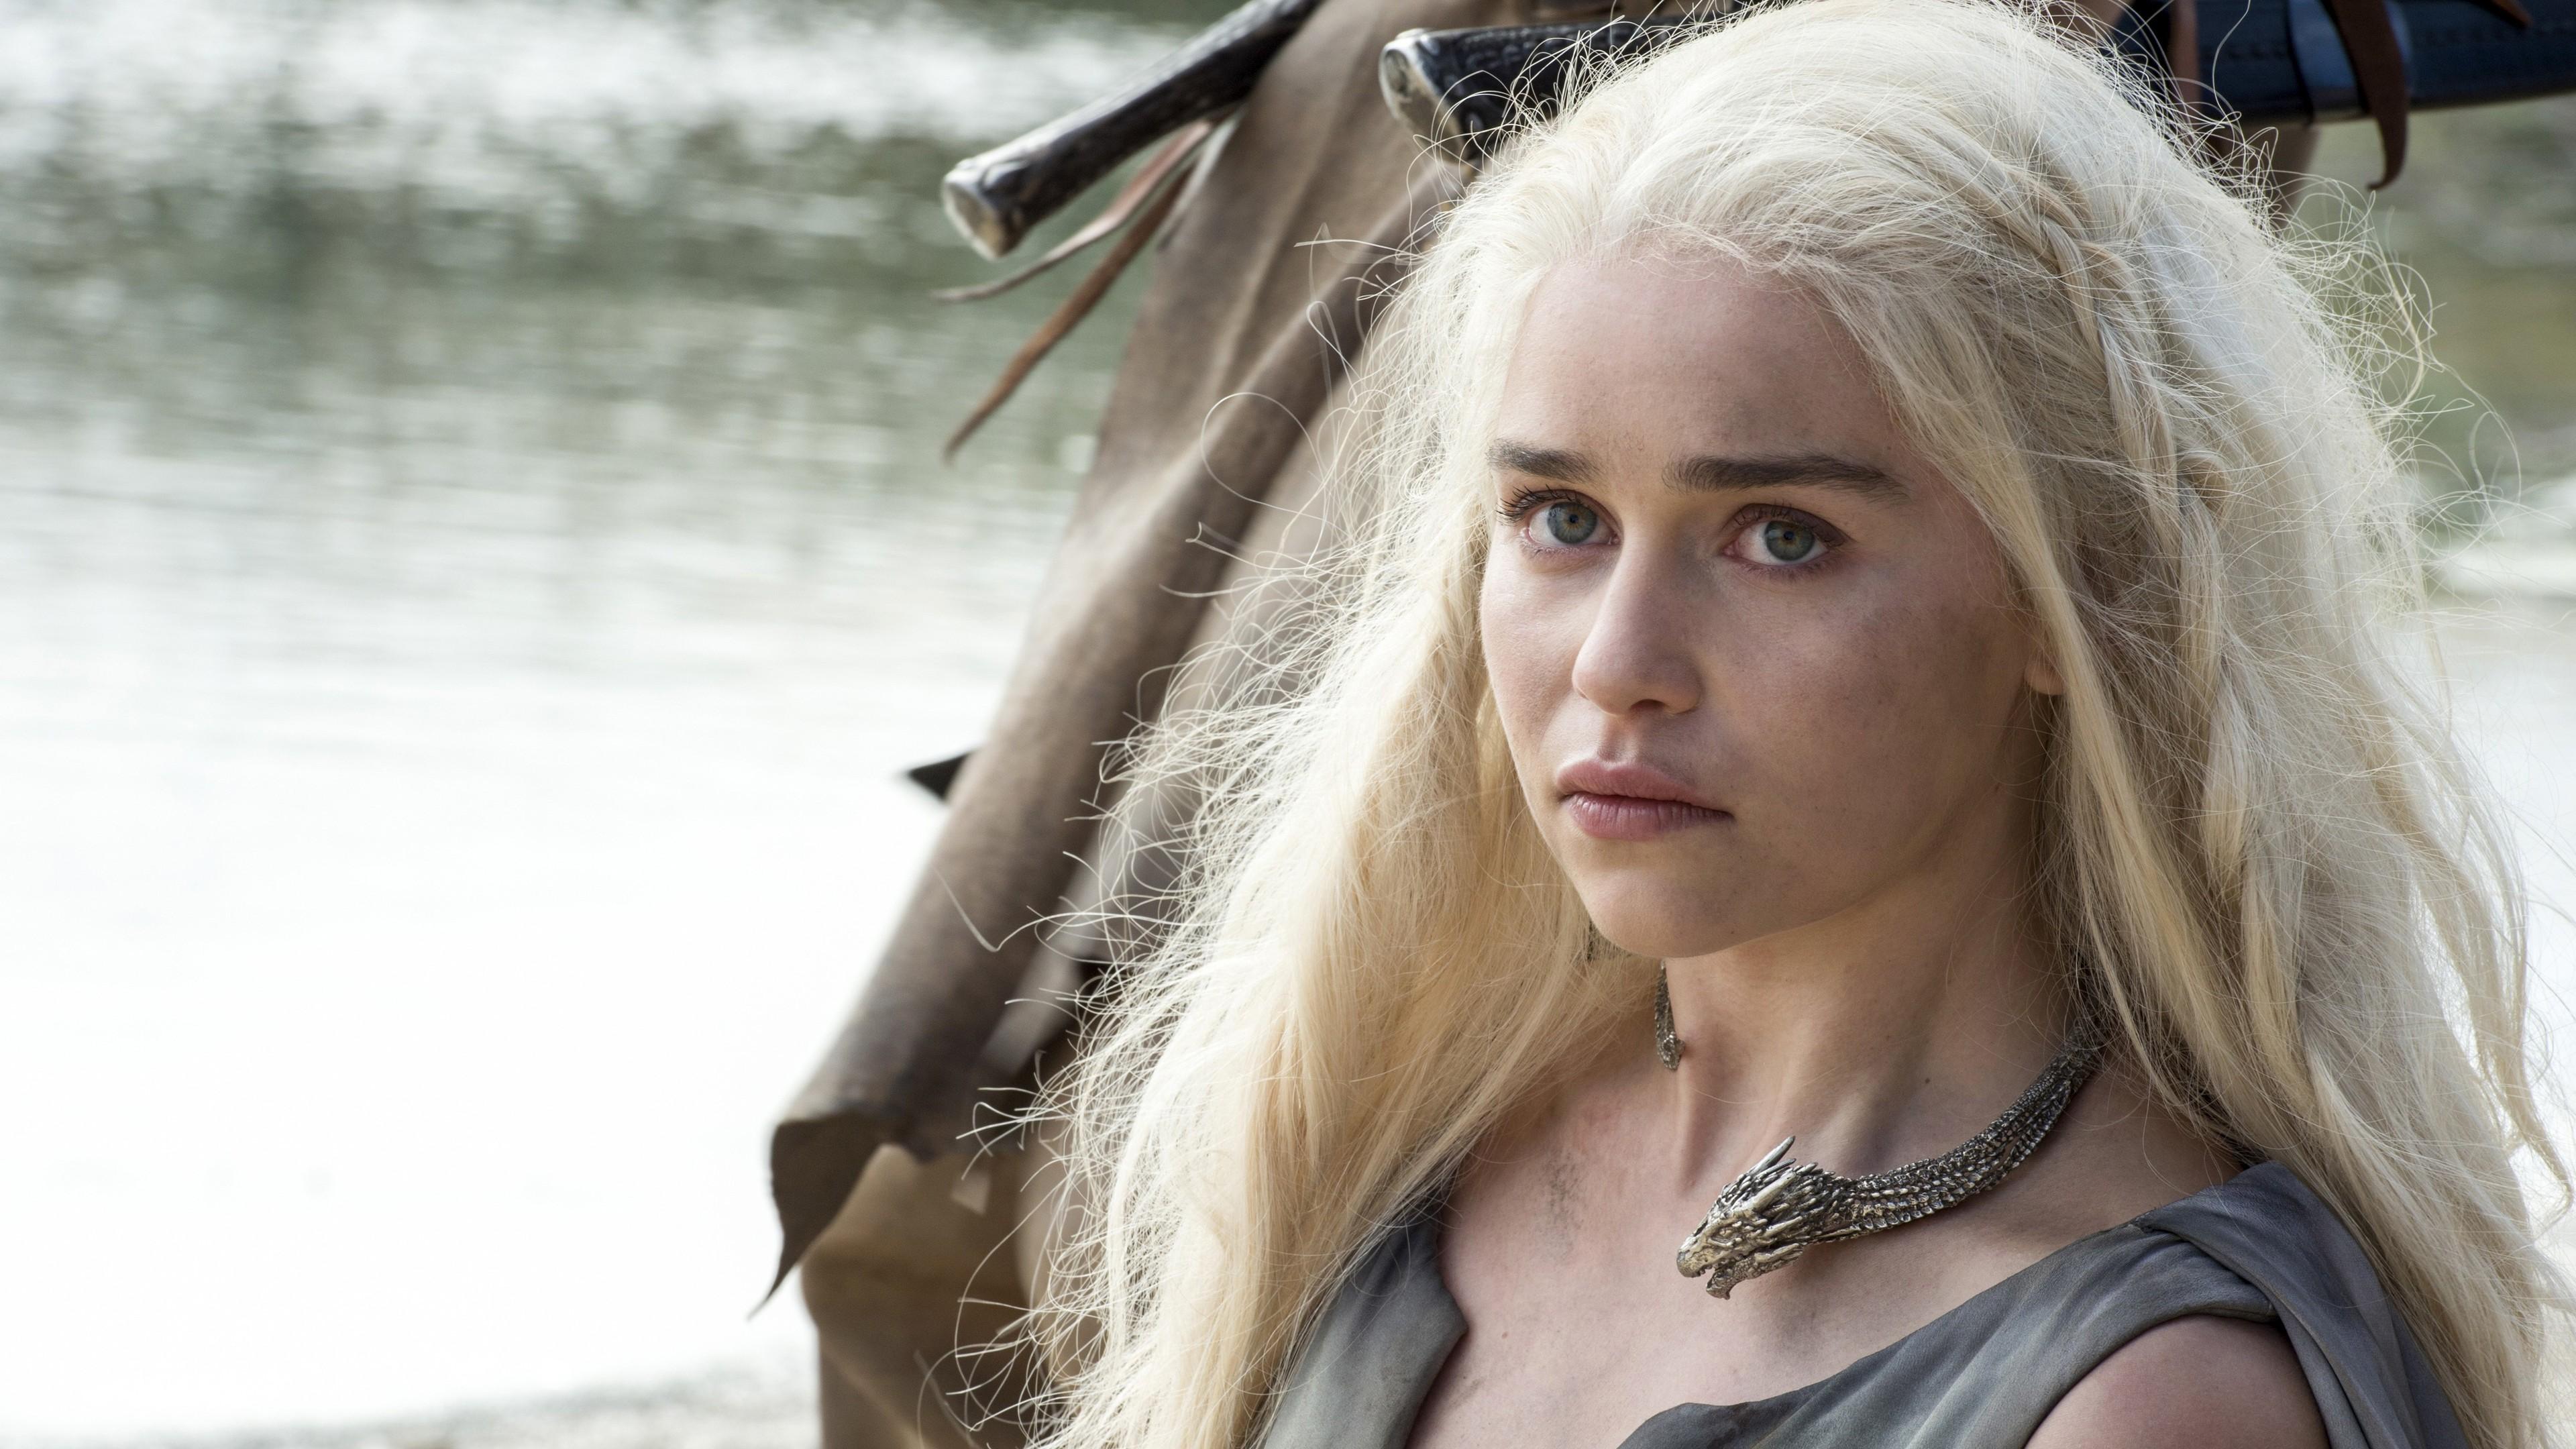 Game Of Thrones Season 6 Wallpapers: Season 6 Game Of Thrones, HD Tv Shows, 4k Wallpapers